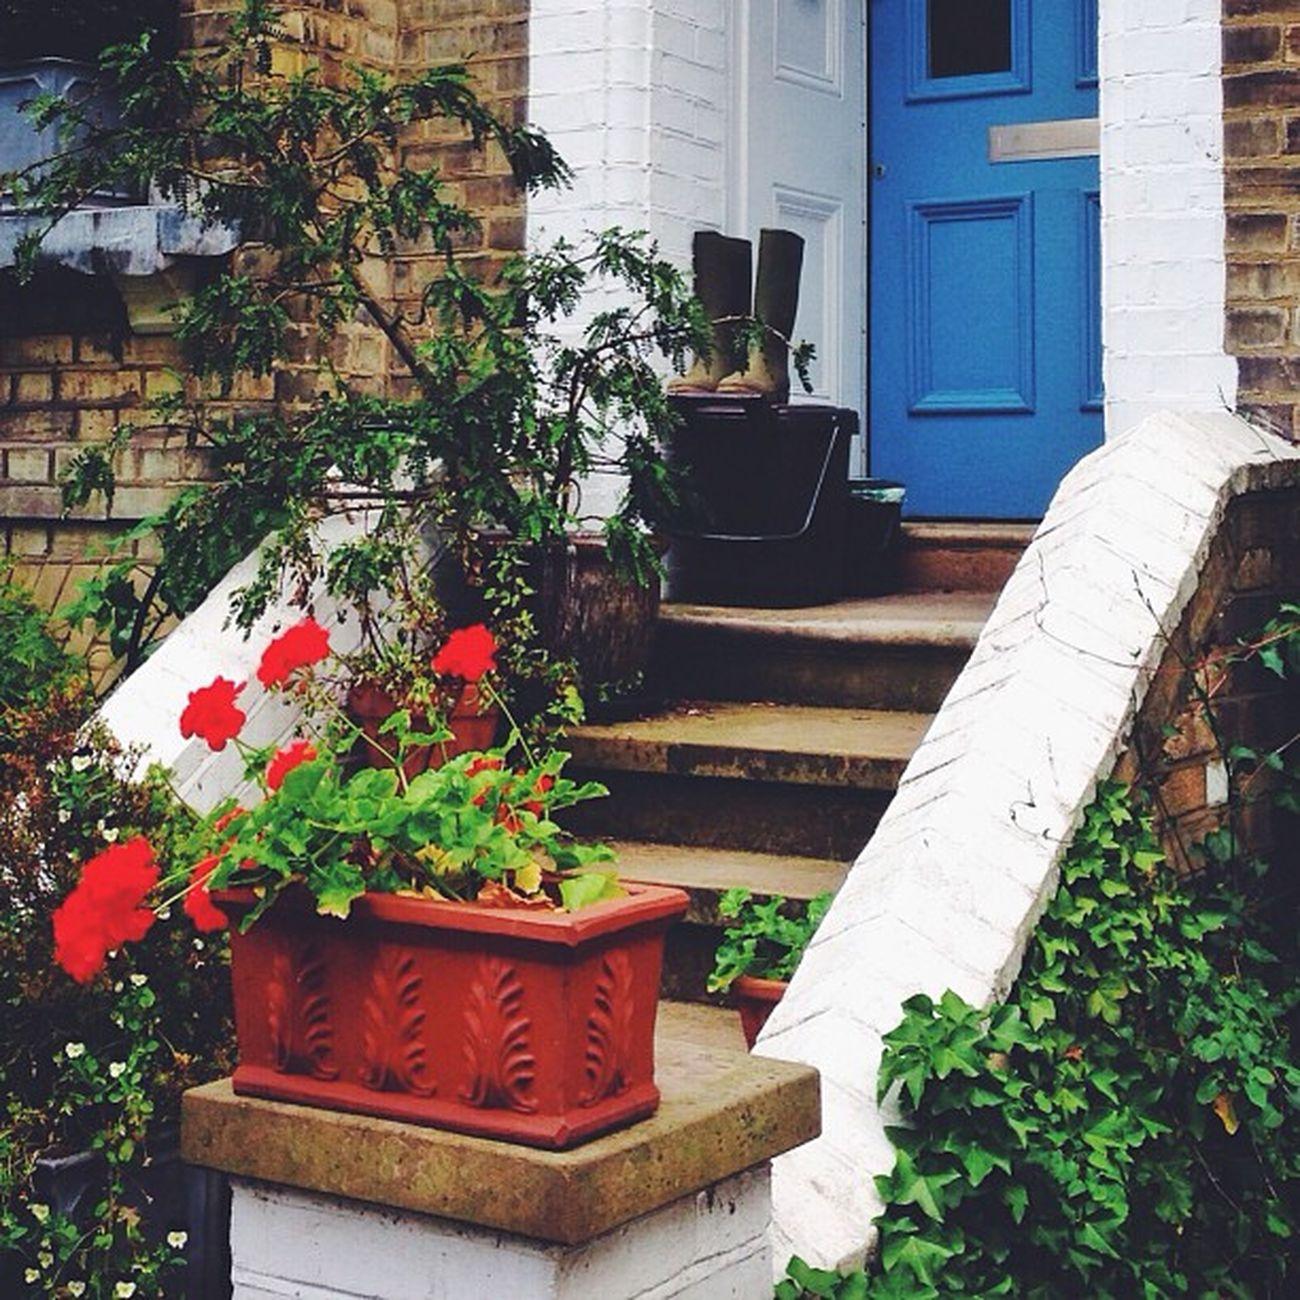 Lovely House in #Hampstead ☀️?????#alan_in_london #gf_uk #gang_family #igers_london #insta_london #london_only #thisislondon #from_city #ic_cities_london #ig_england #love_london #gi_uk #ig_london #londonpop #allshots_ #aauk #mashpics #pro_shooters #cap Love_london Ic_cities_london Ig_london Aauk Gang_family Capture_today Londonpop Loveyoursummer Allshots_ Mashpics London_only Top_masters Hampstead  From_city Gf_uk Pro_shooters Alan_in_london Insta_london Thisislondon Gi_uk Igers_london Ig_england